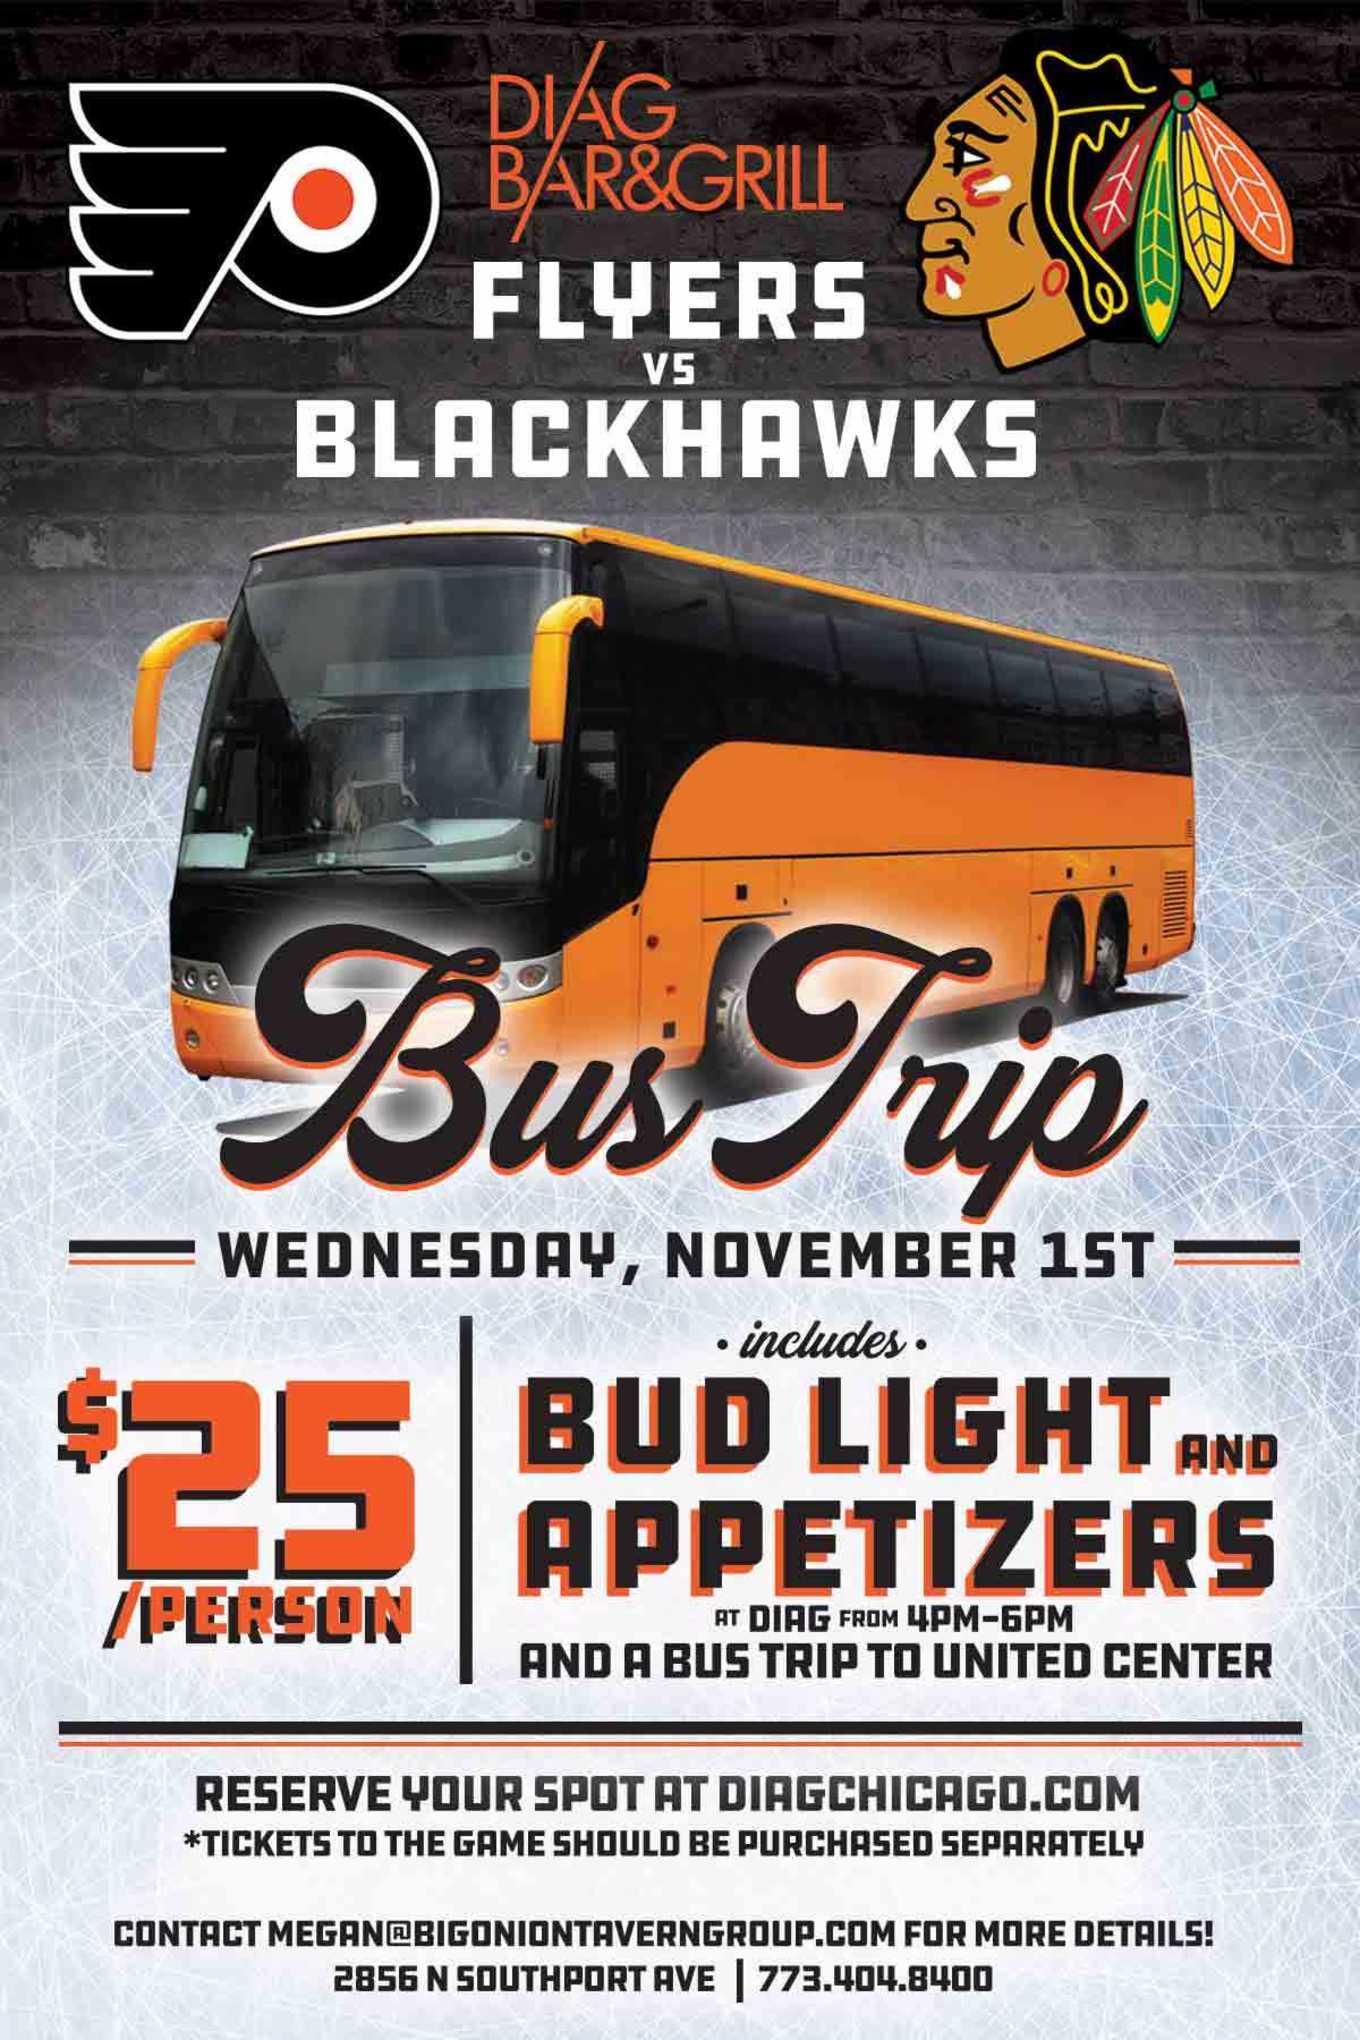 Flyers Bus Trip Mersnoforum